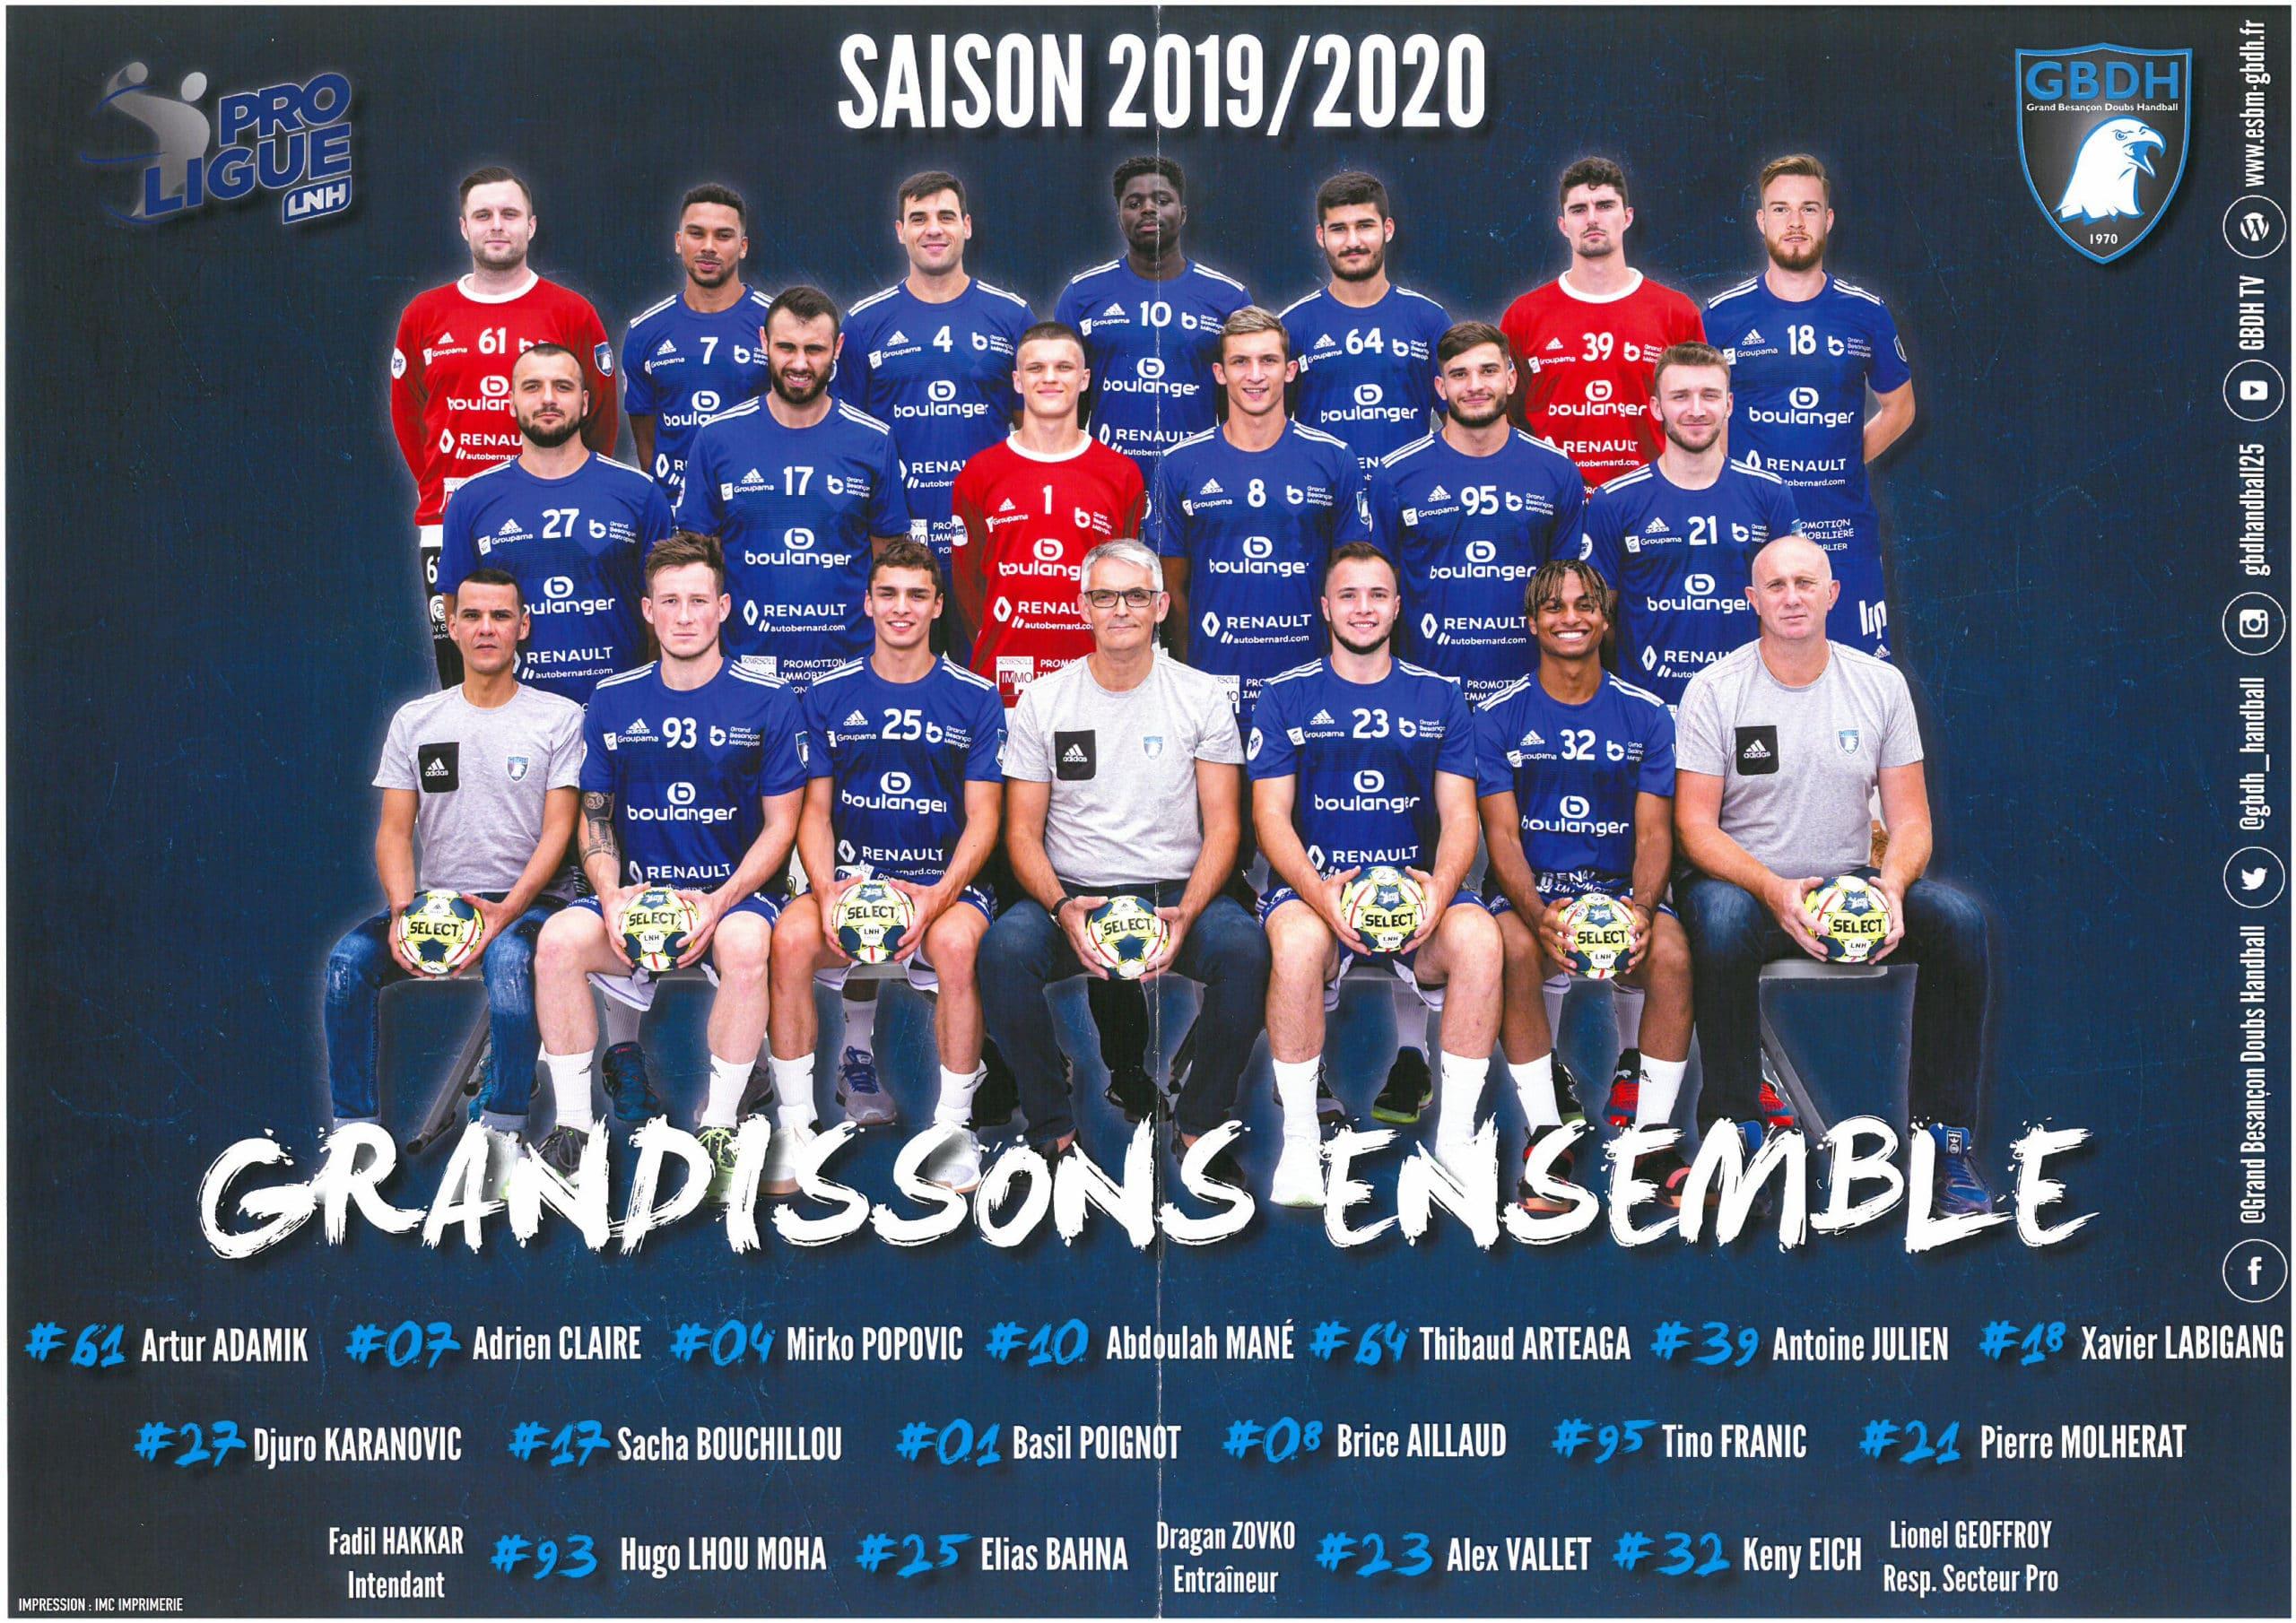 Soutien sportif : handball